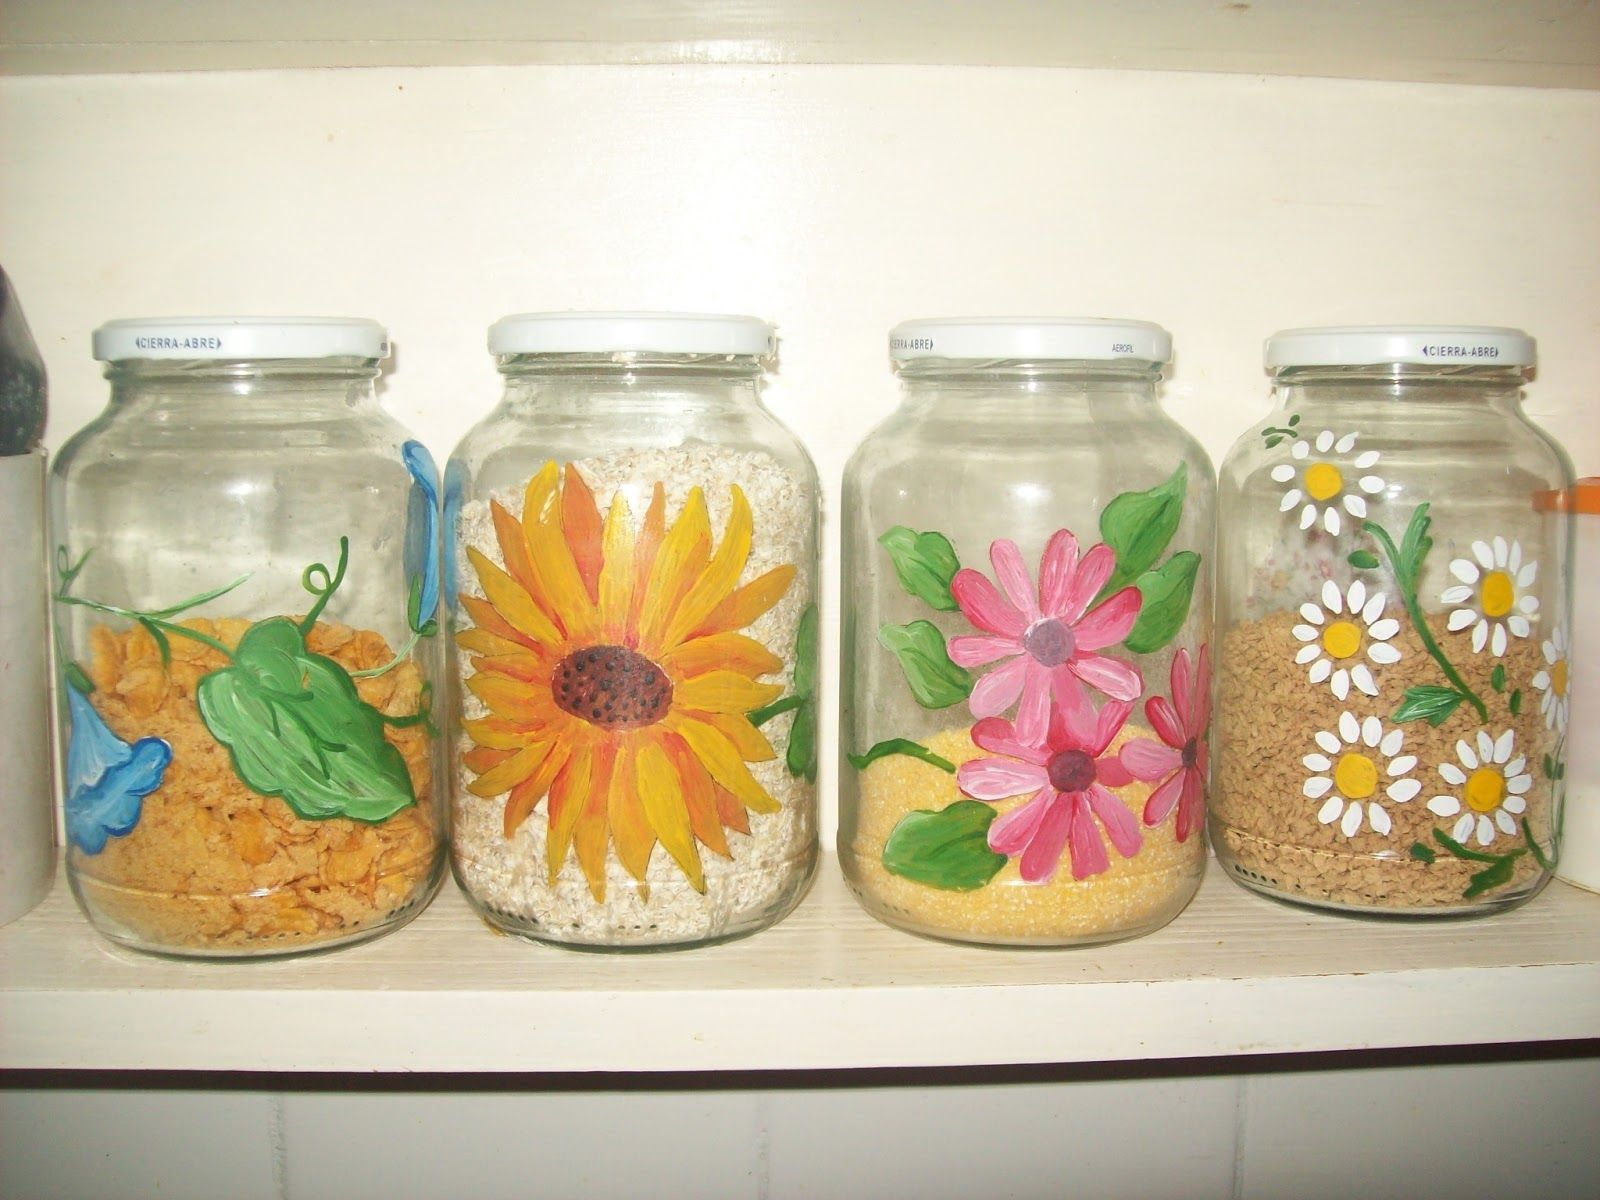 Reciclarte frascos decorados botellas de vino - Manualidades con envases ...